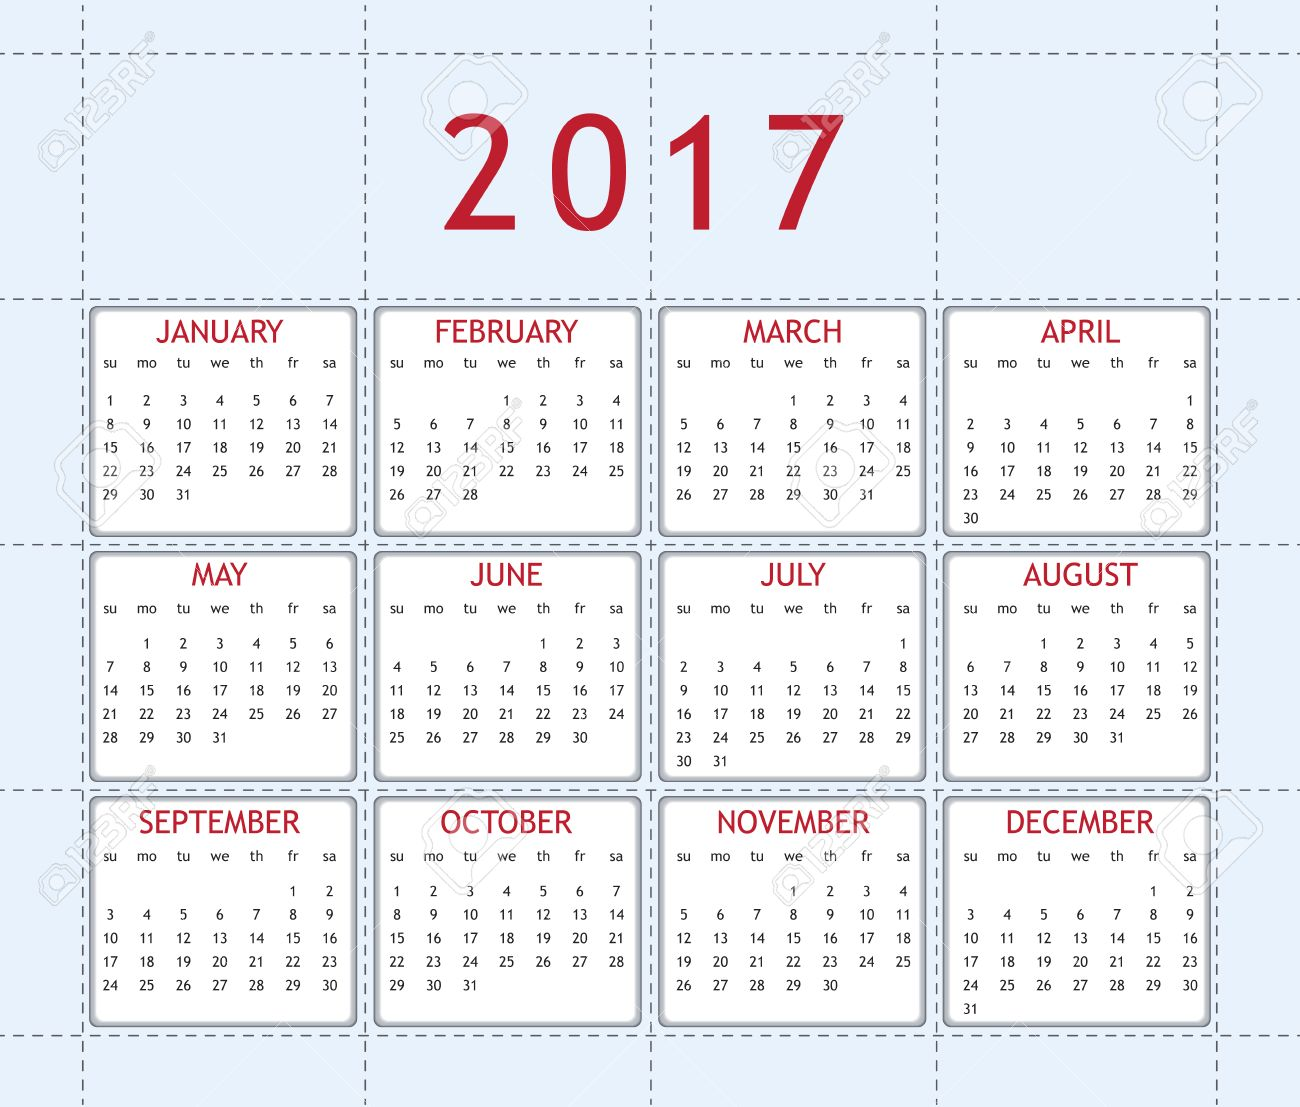 Каким будет июль 2017 года